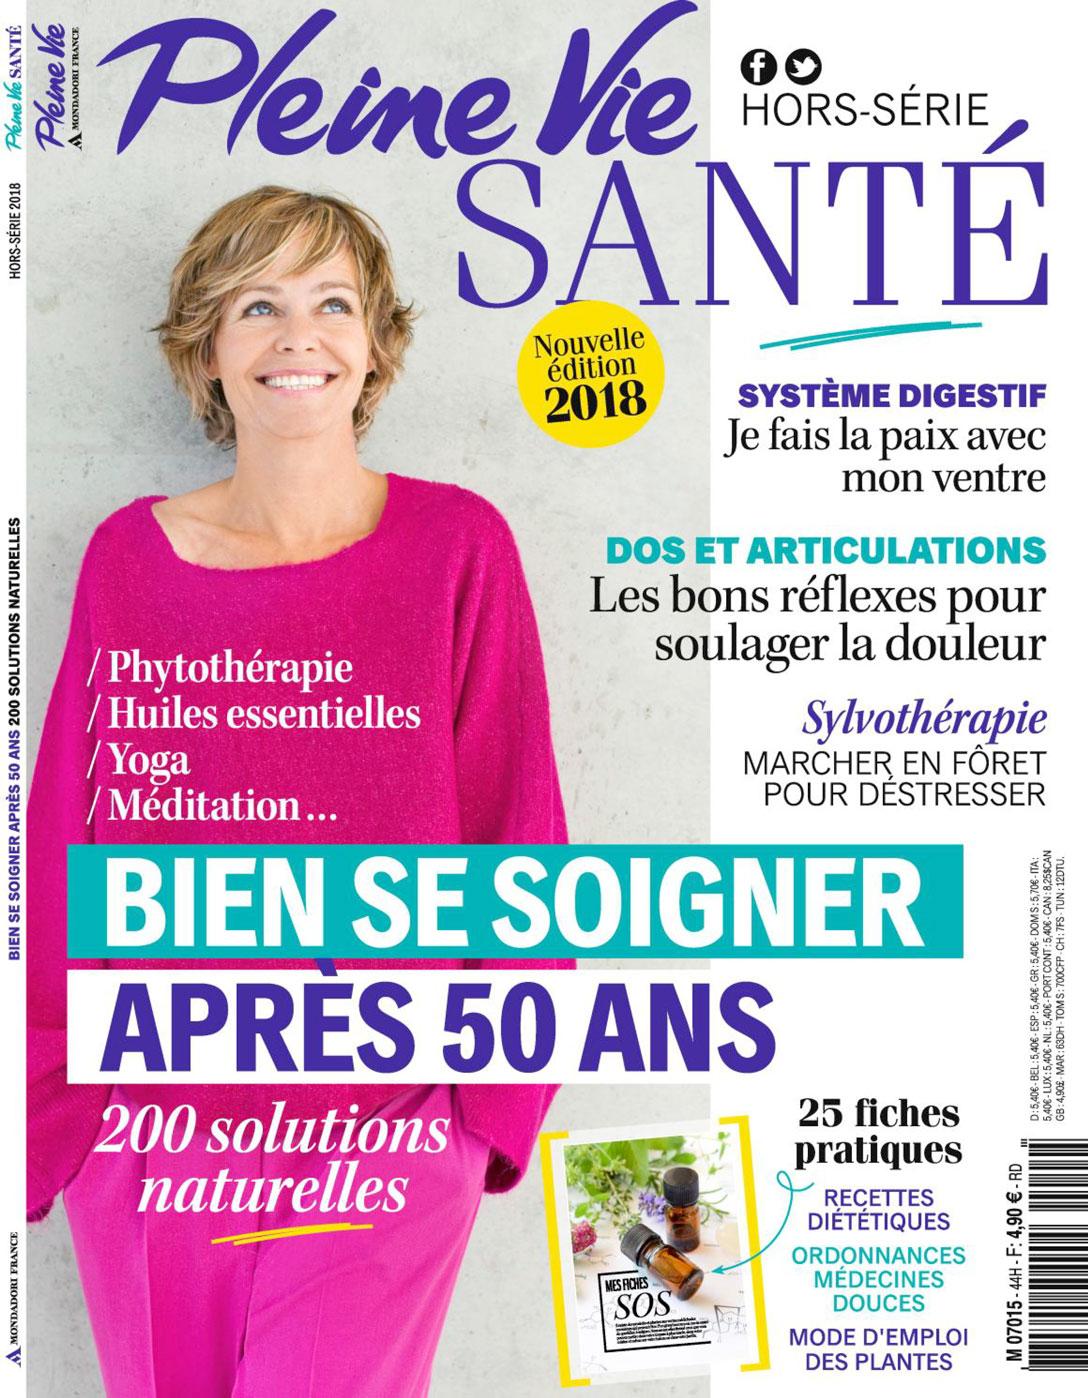 Pleine_Vie_-_Hors-Serie_Sante_2018-1.jpg